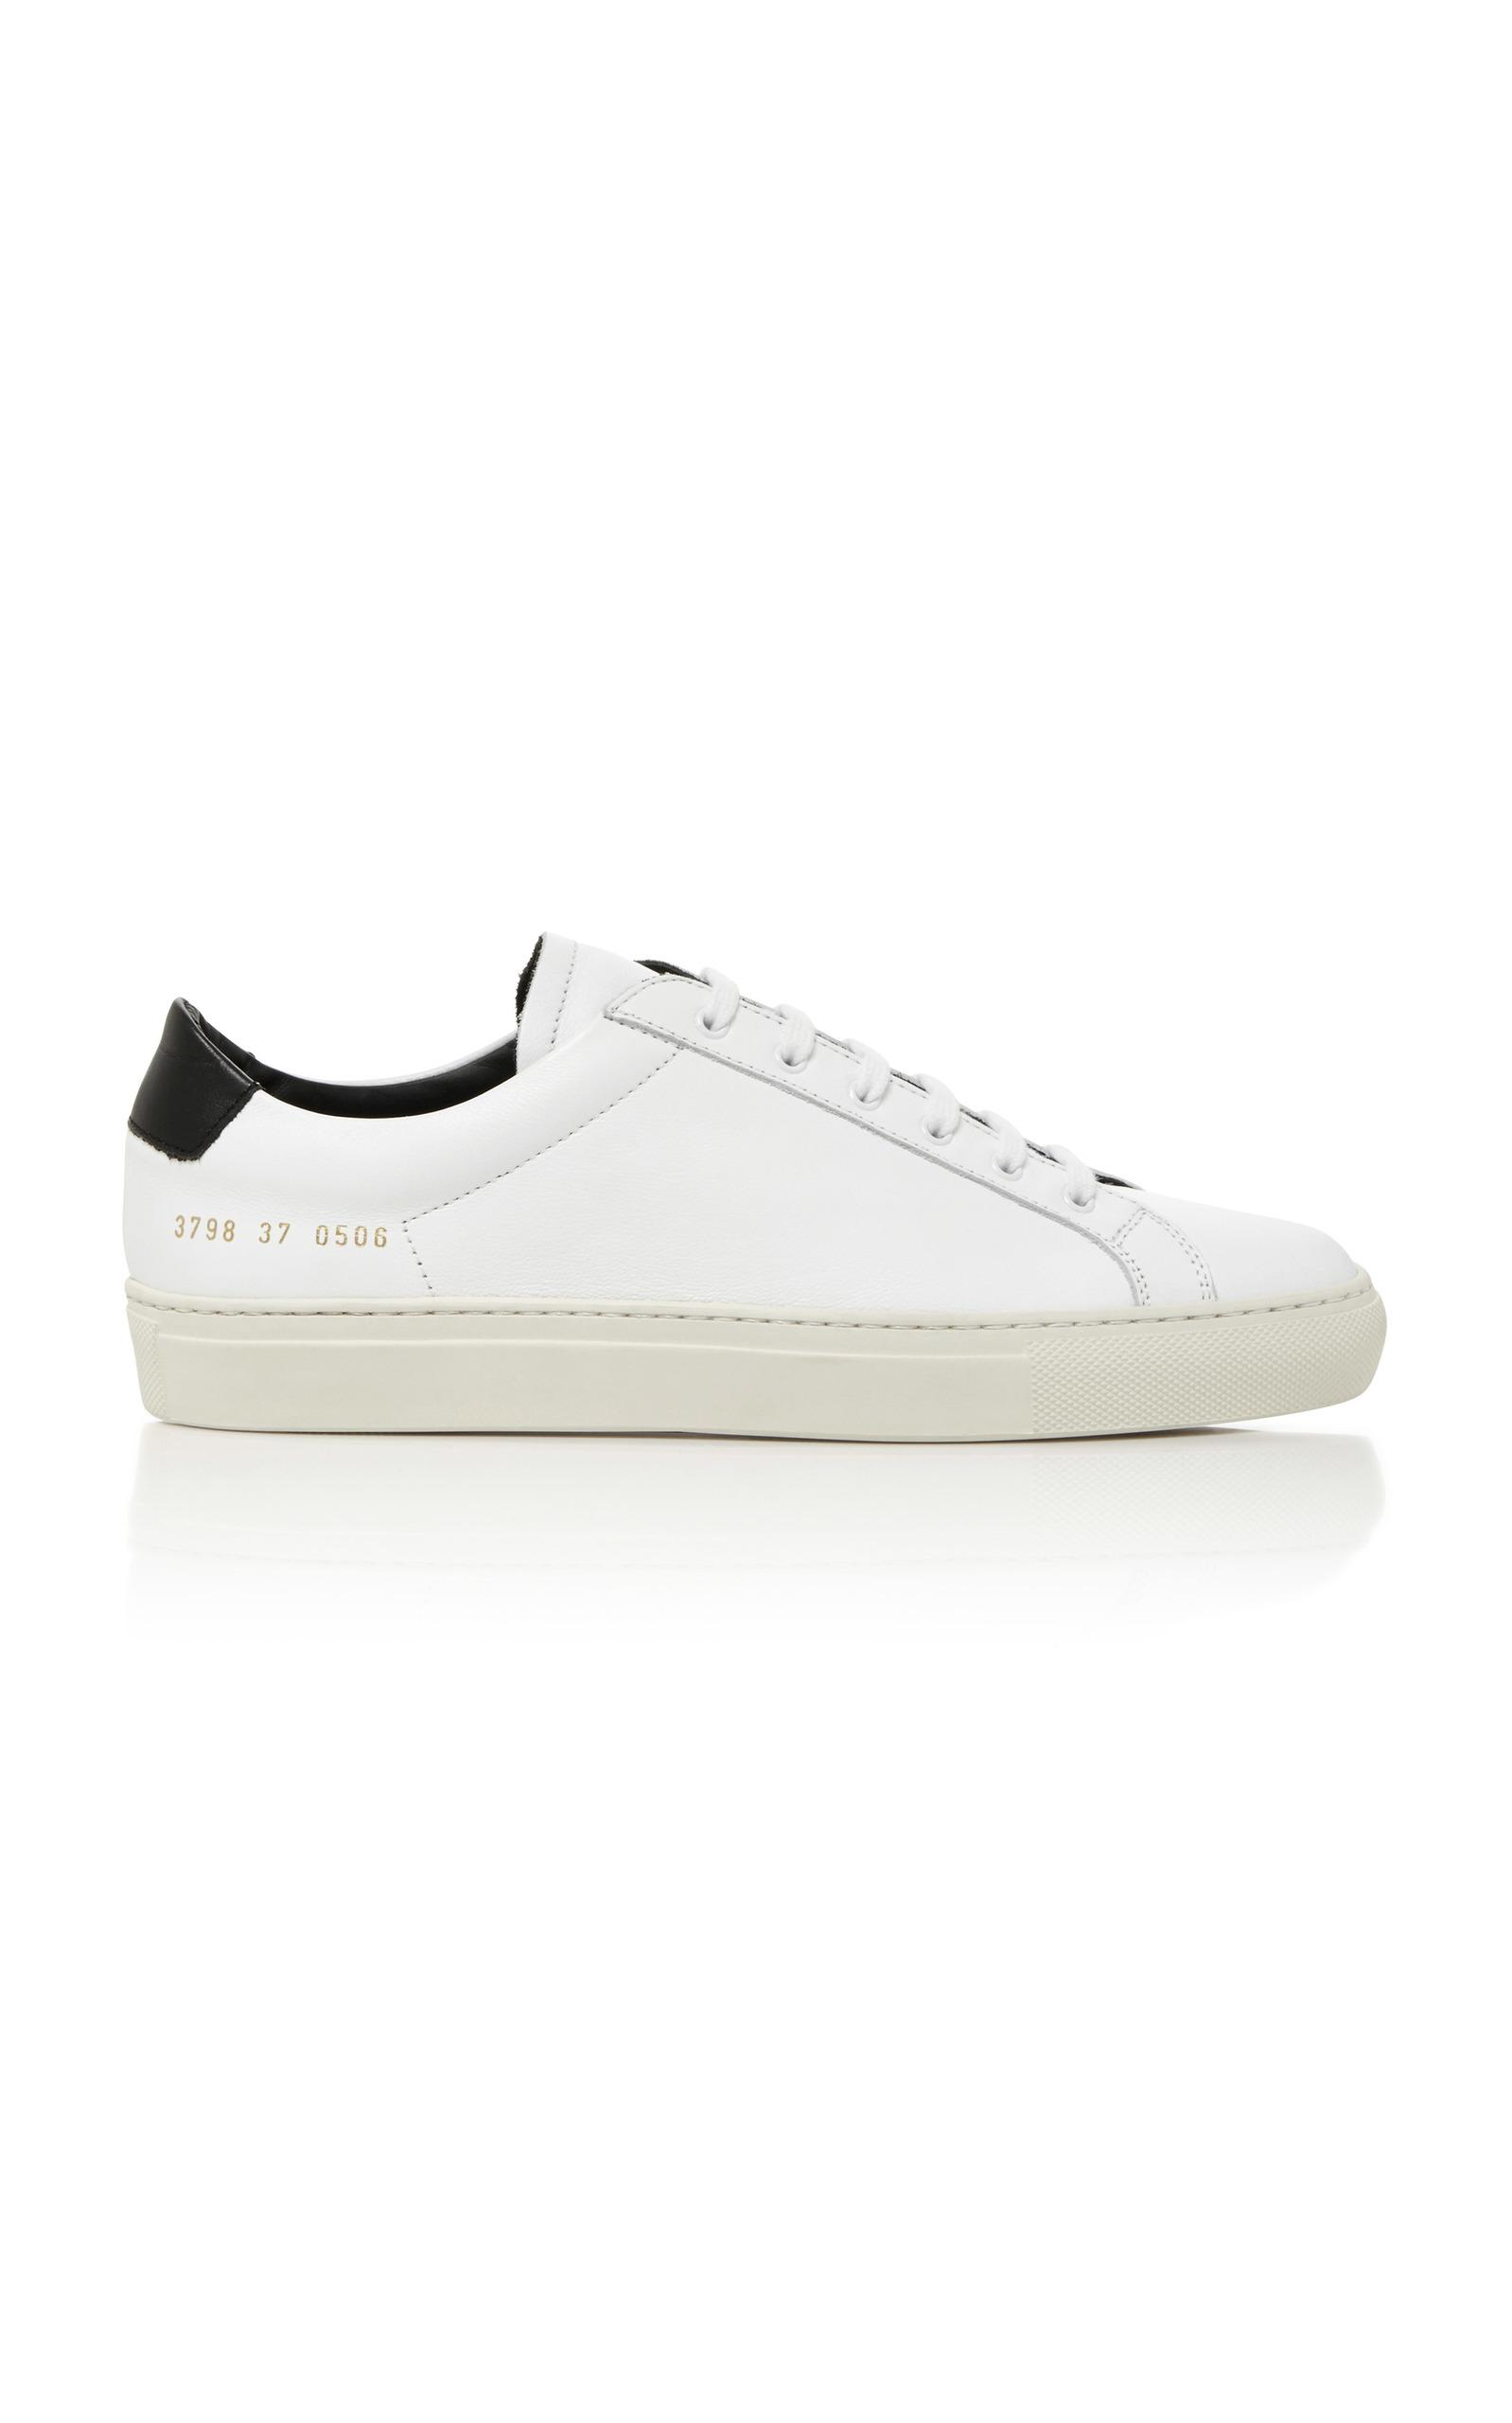 Common Projects Achilles Achilles Projects laceup sneakers Verde 2018 Zapatos d80e9b